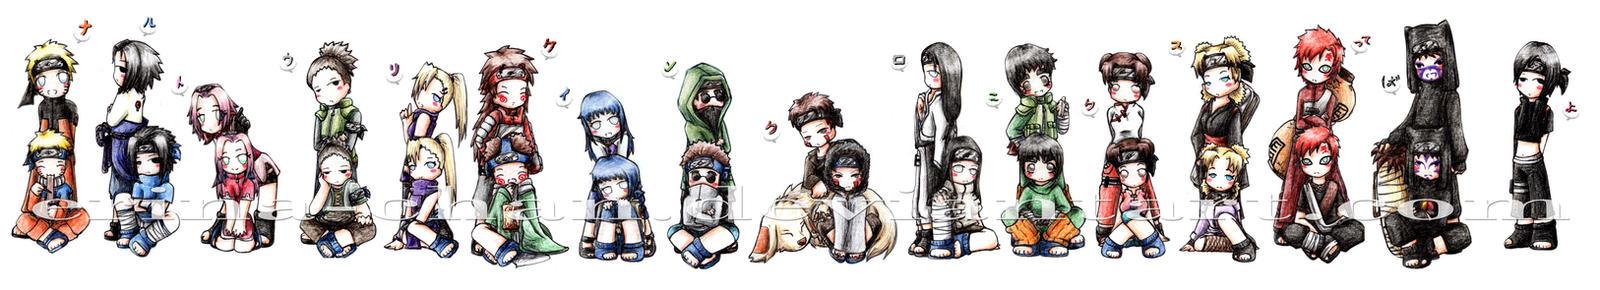 Naruto - Grow up by Erina-chan